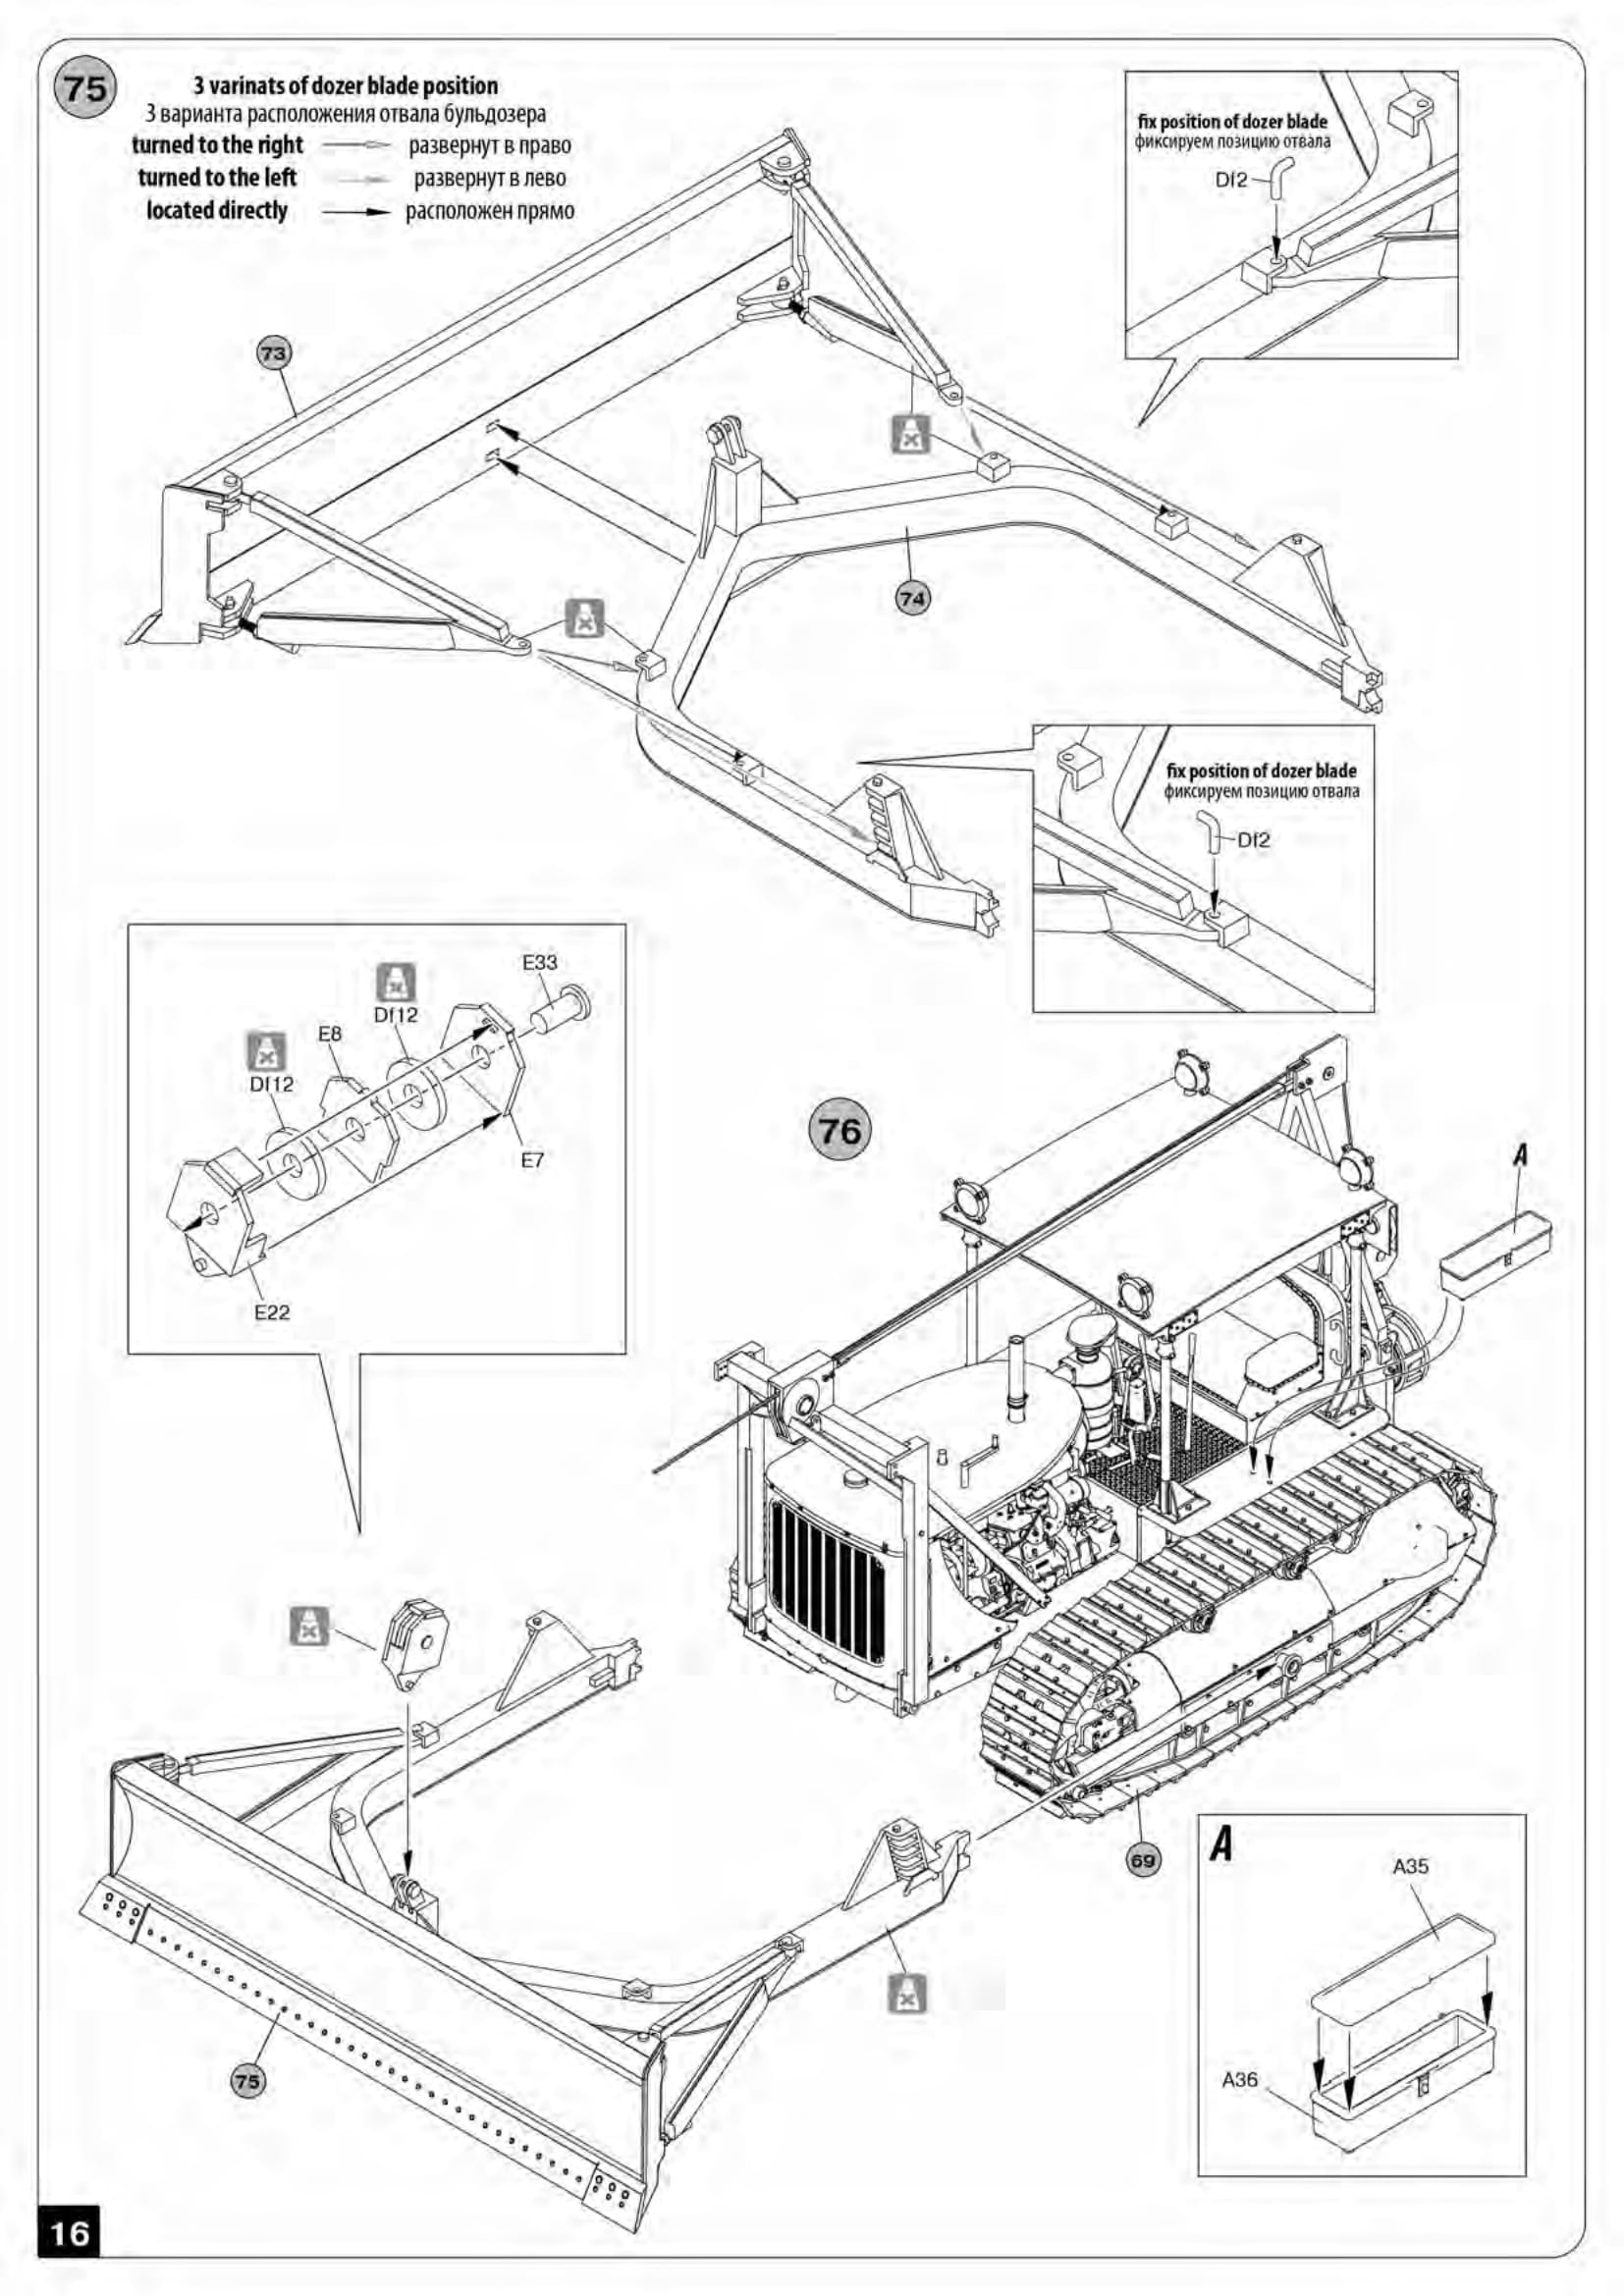 2006 International 4300 Ac Wiring Diagram